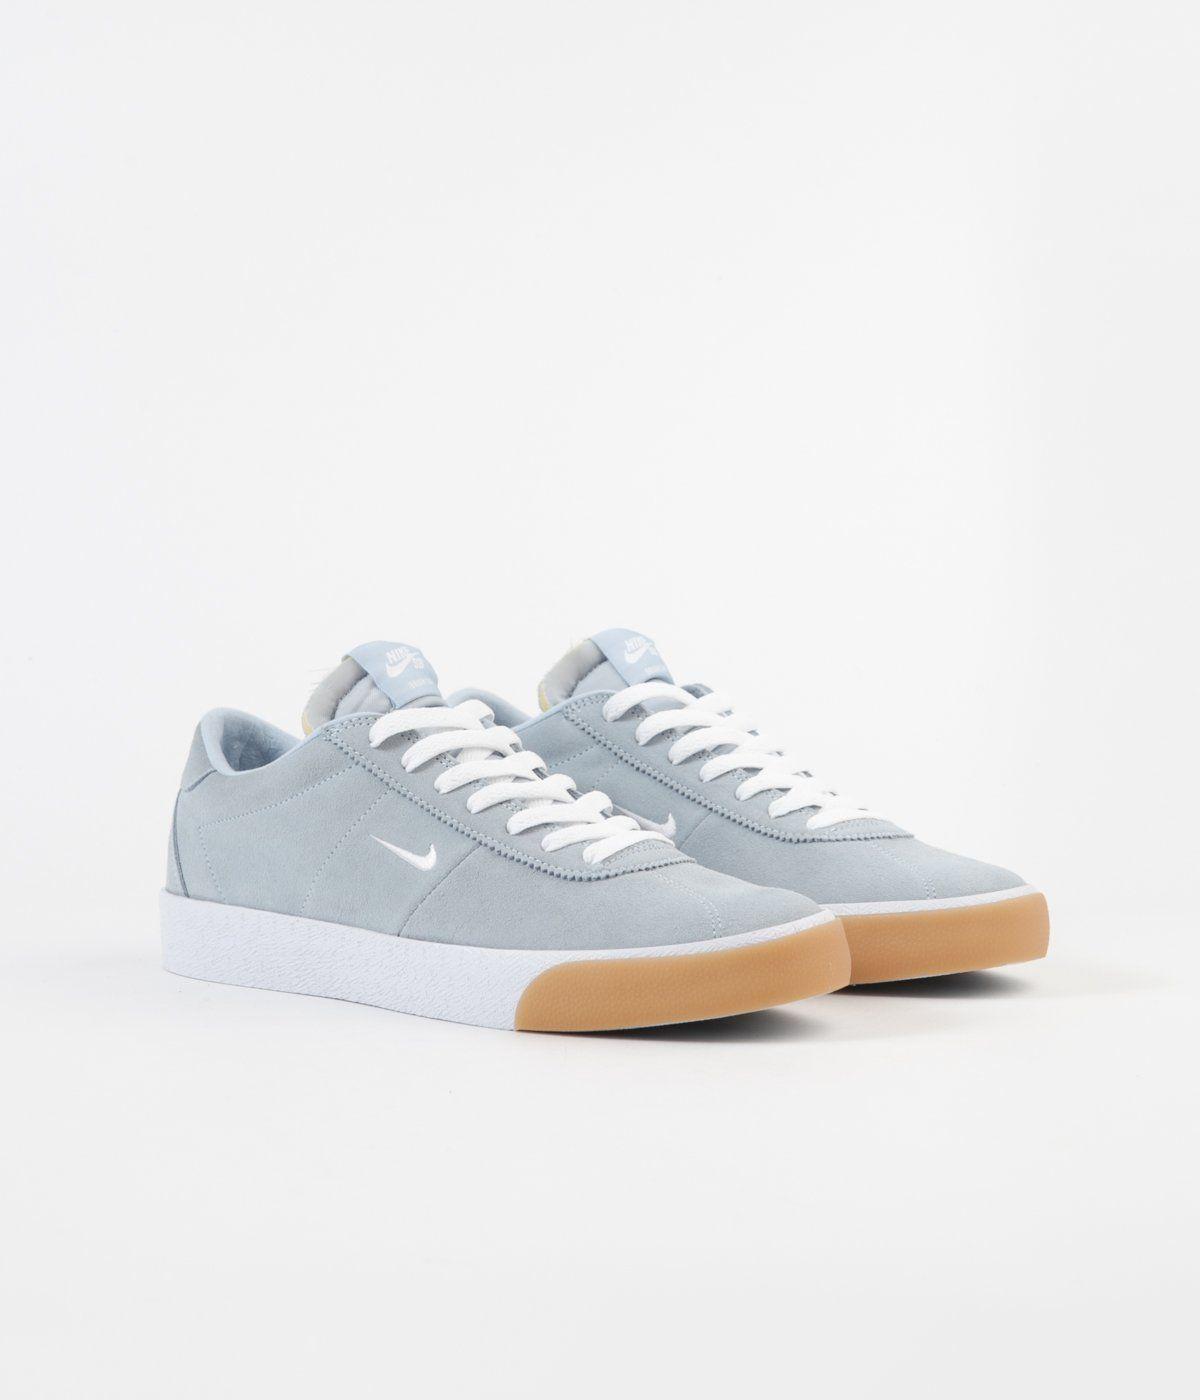 Nike SB Bruin Ultra Shoes Light Armory Blue White Gum